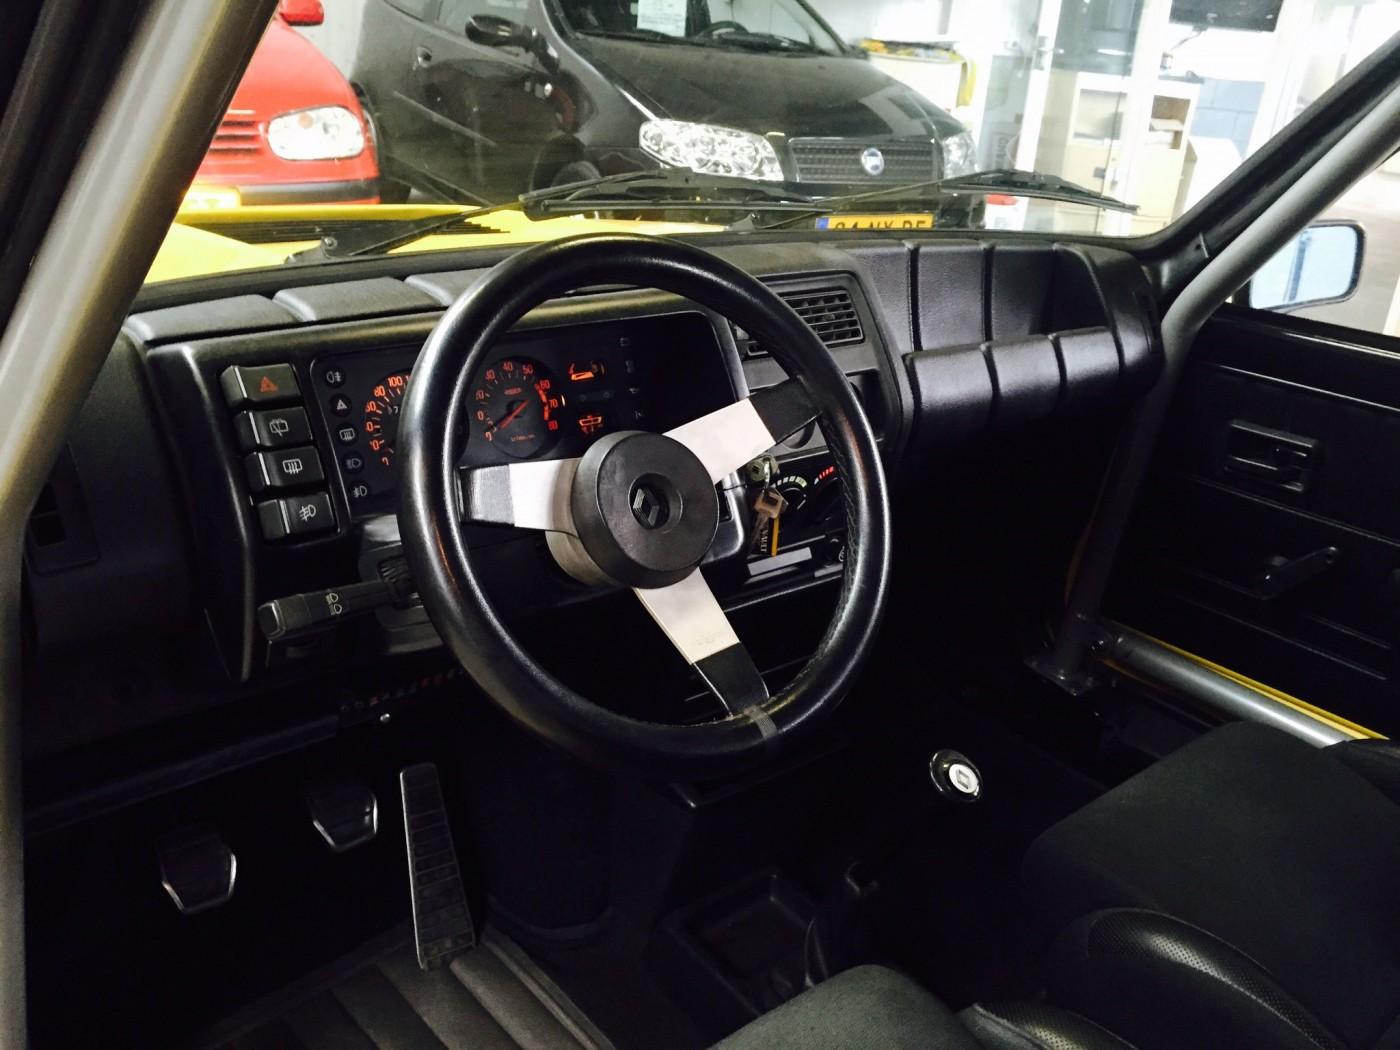 Renault_5_R5_Turbo_2_0001